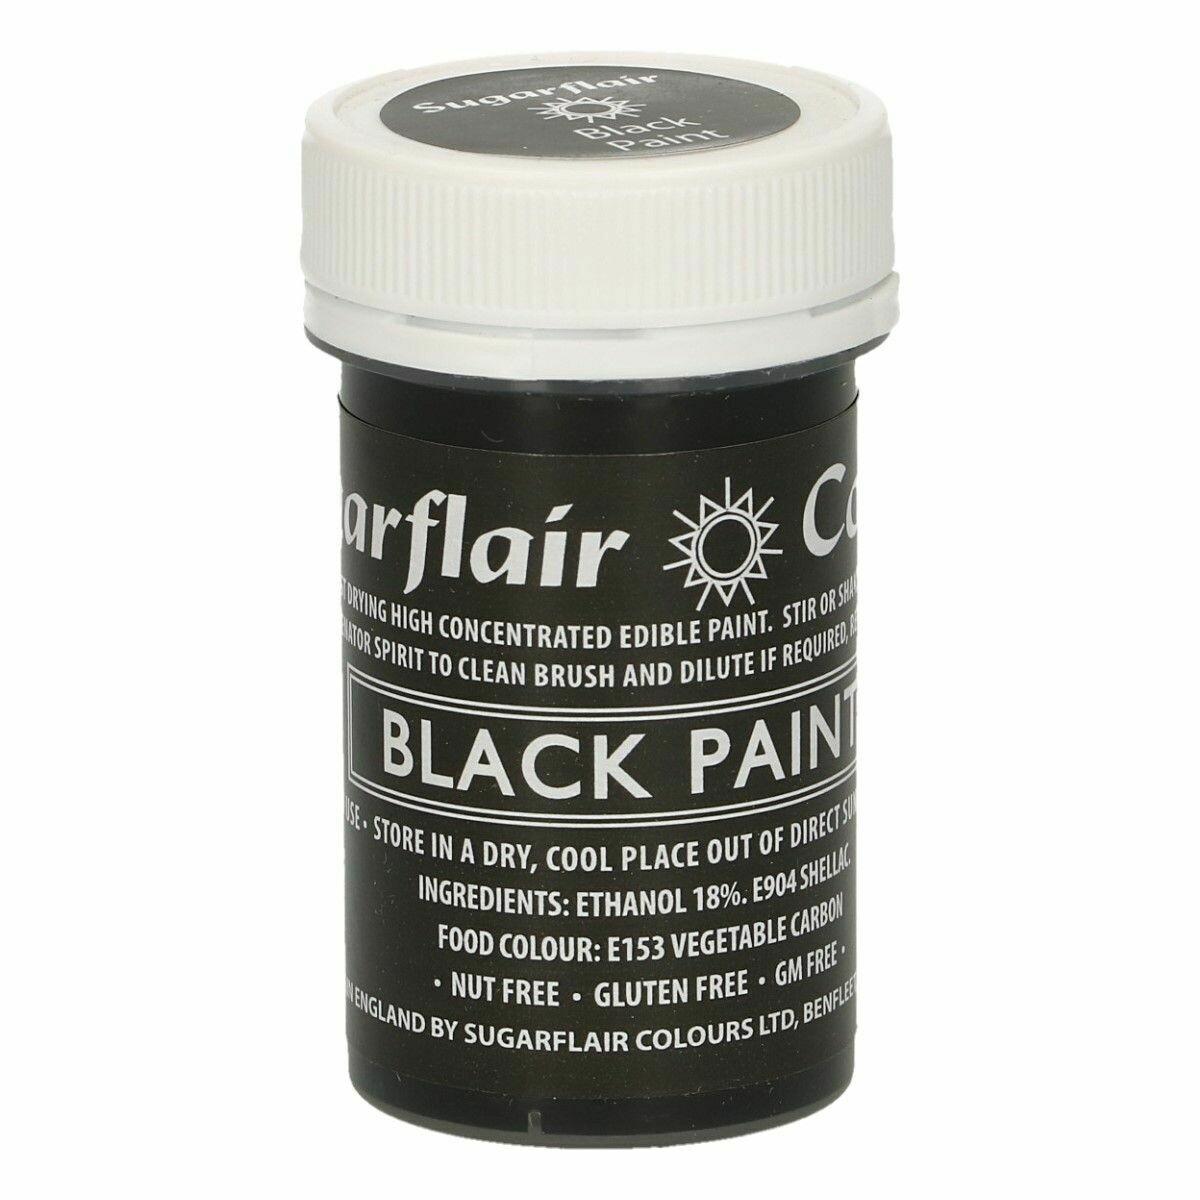 Sugarflair Matt Food Paints -BLACK -Ματ Βρώσιμο Χρώμα Ζωγραφικής -Μαύρο 20γρ